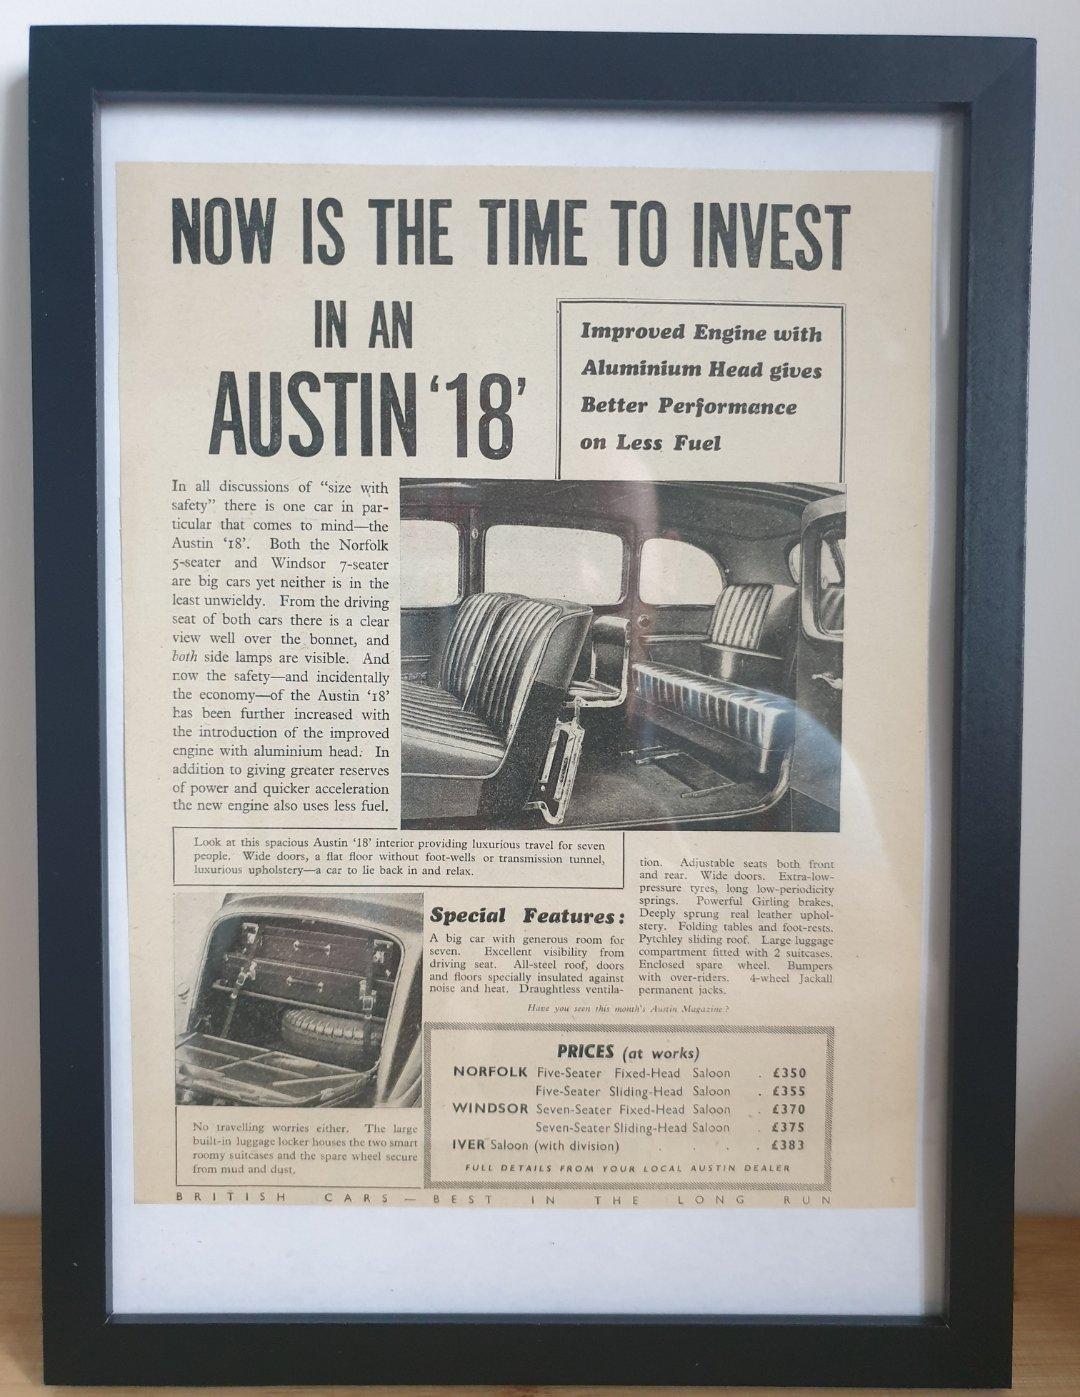 1979 Original 1938 Austin 18 Framed Advert  For Sale (picture 1 of 3)